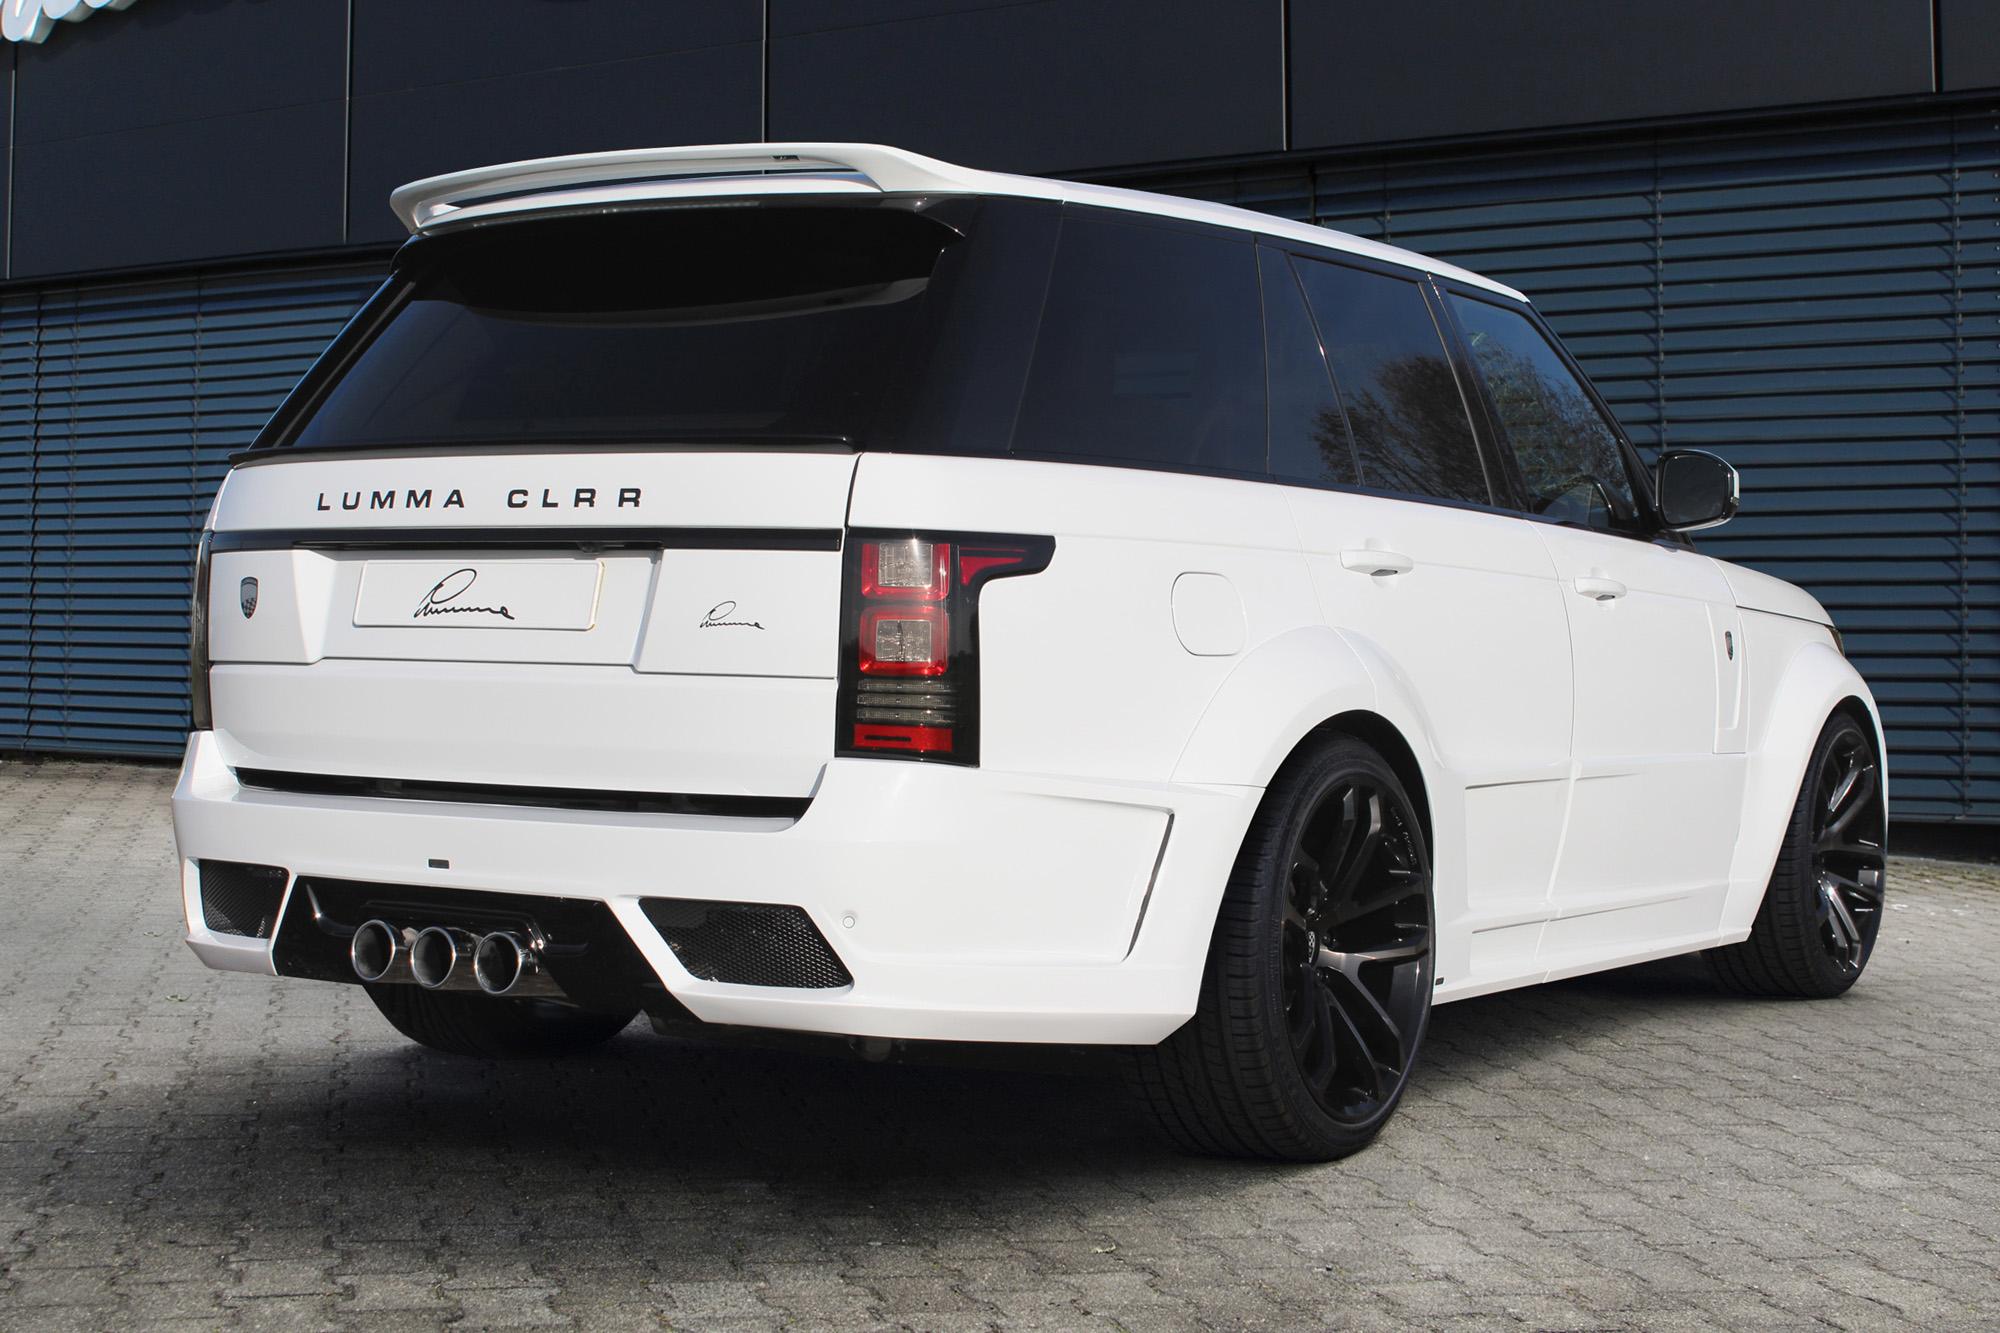 range-rover-lg-lumma-design-clr-r-gt-evo-010